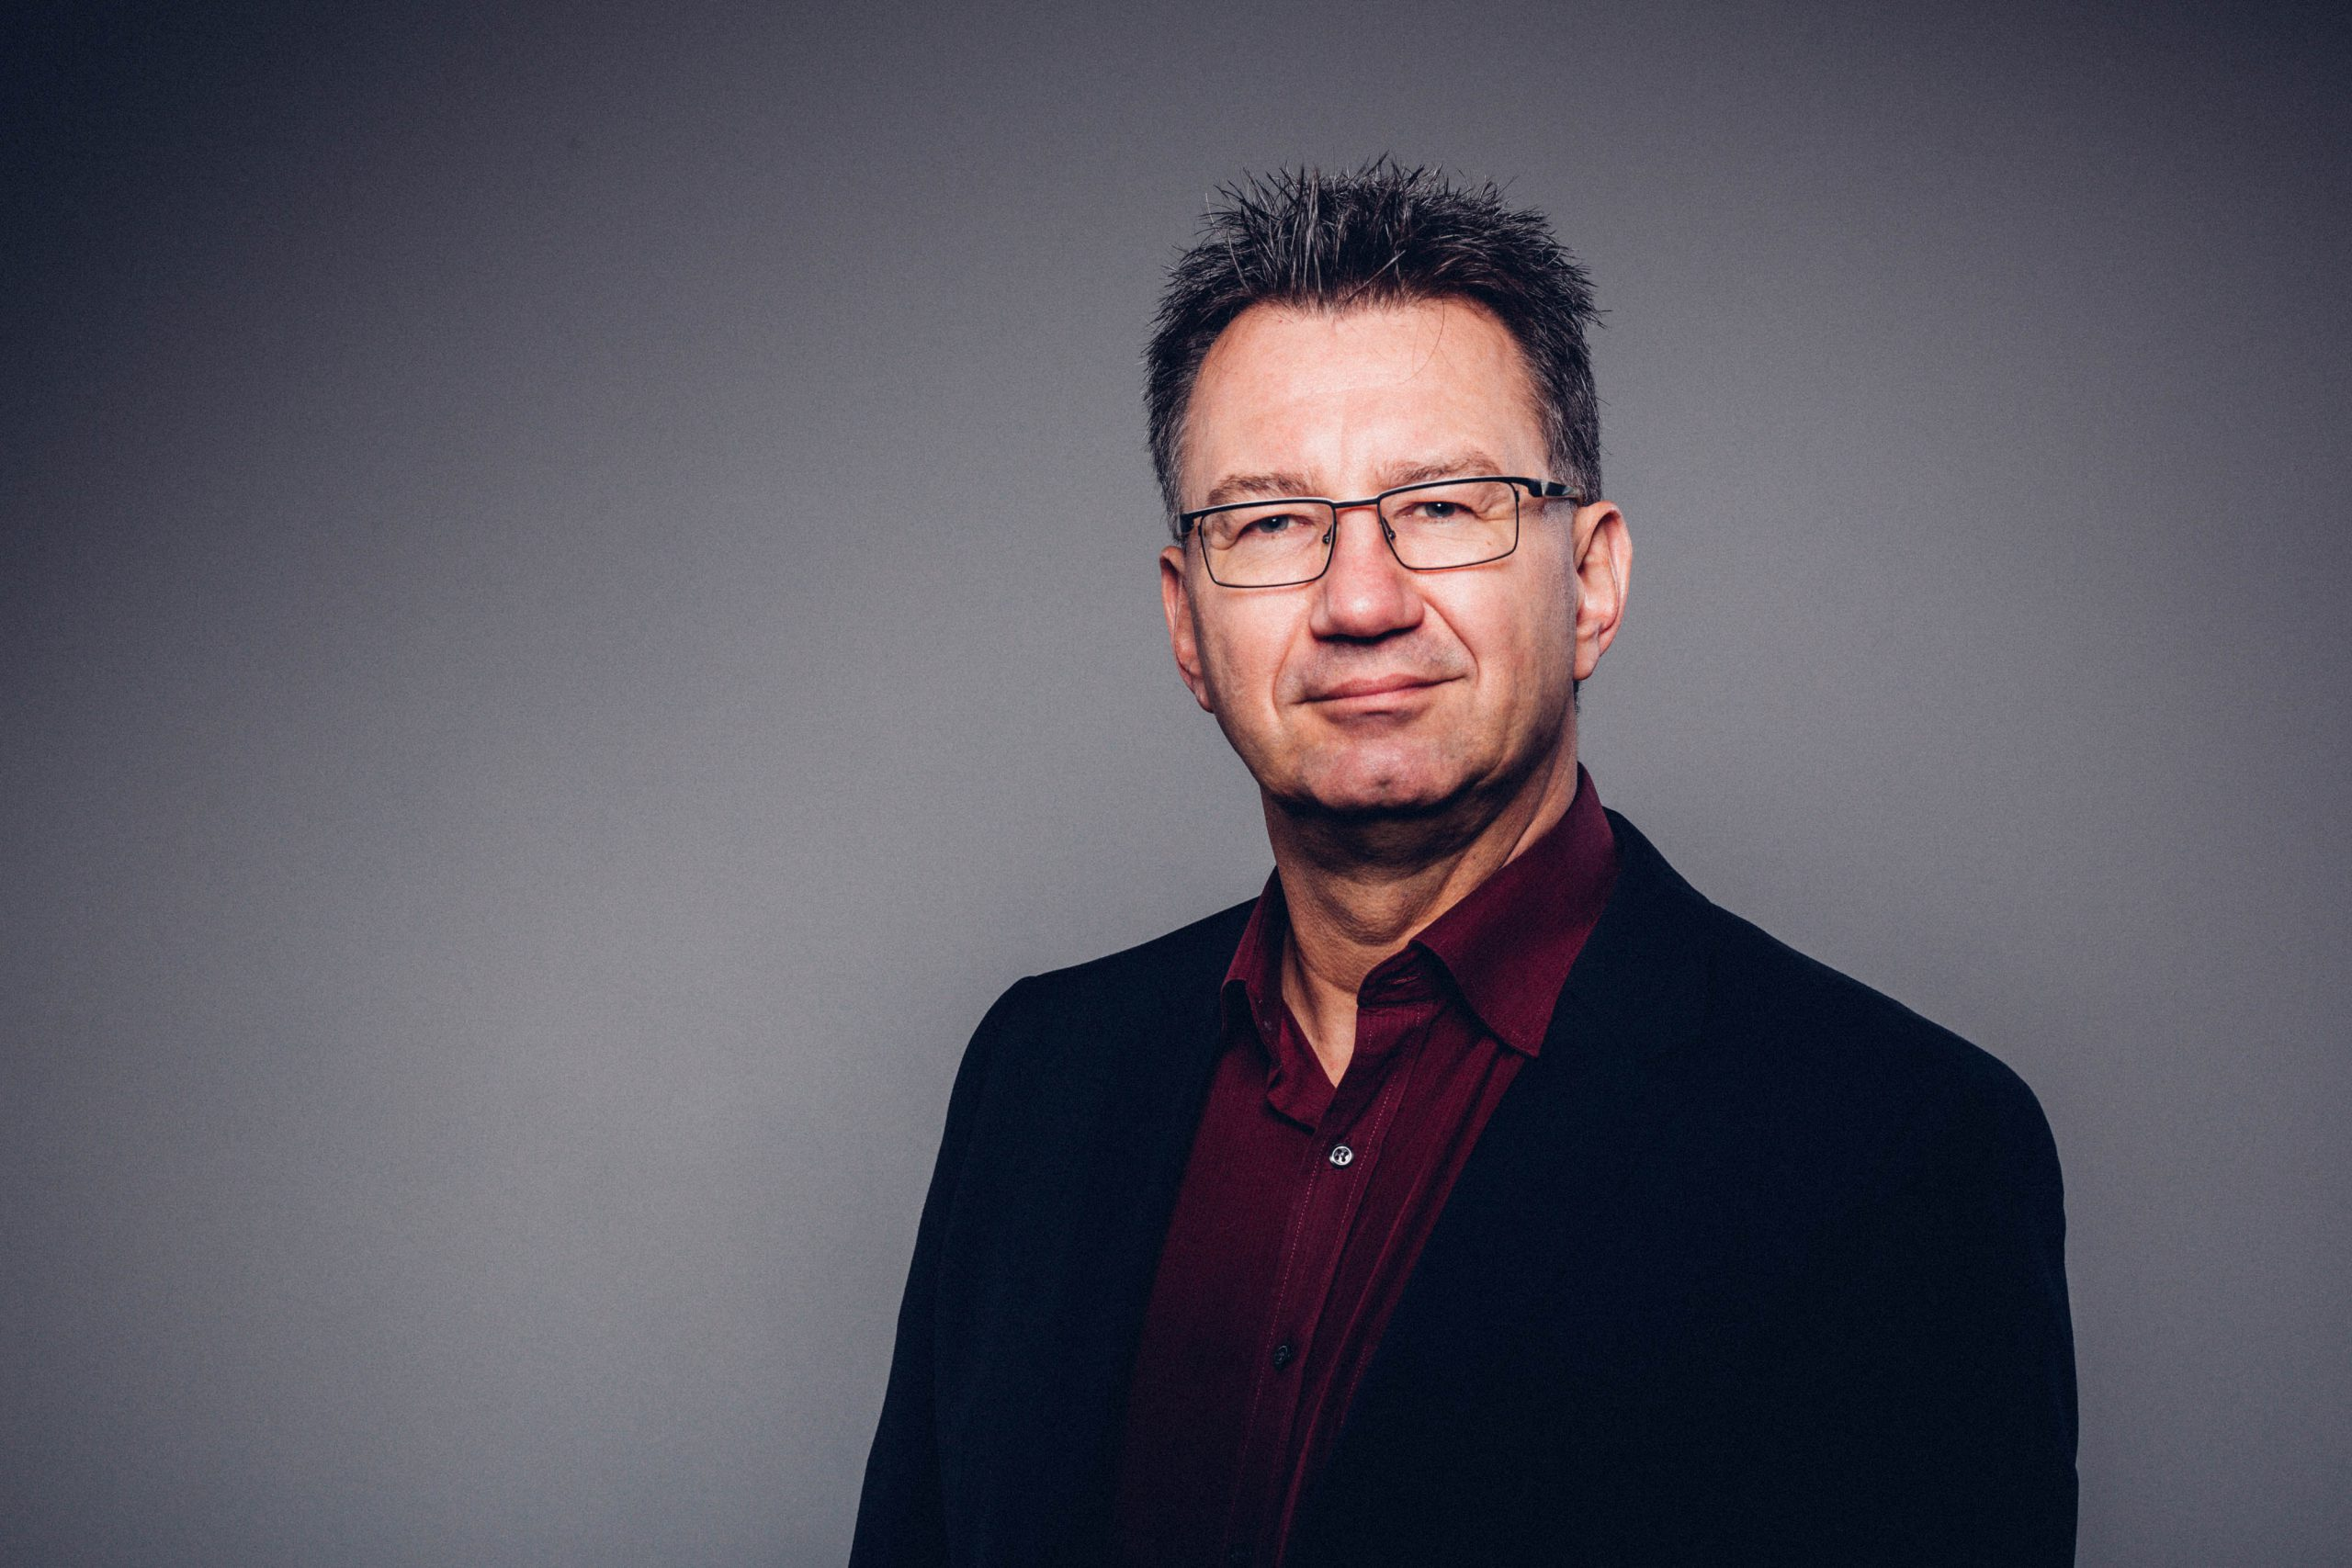 Ralph Königbauer